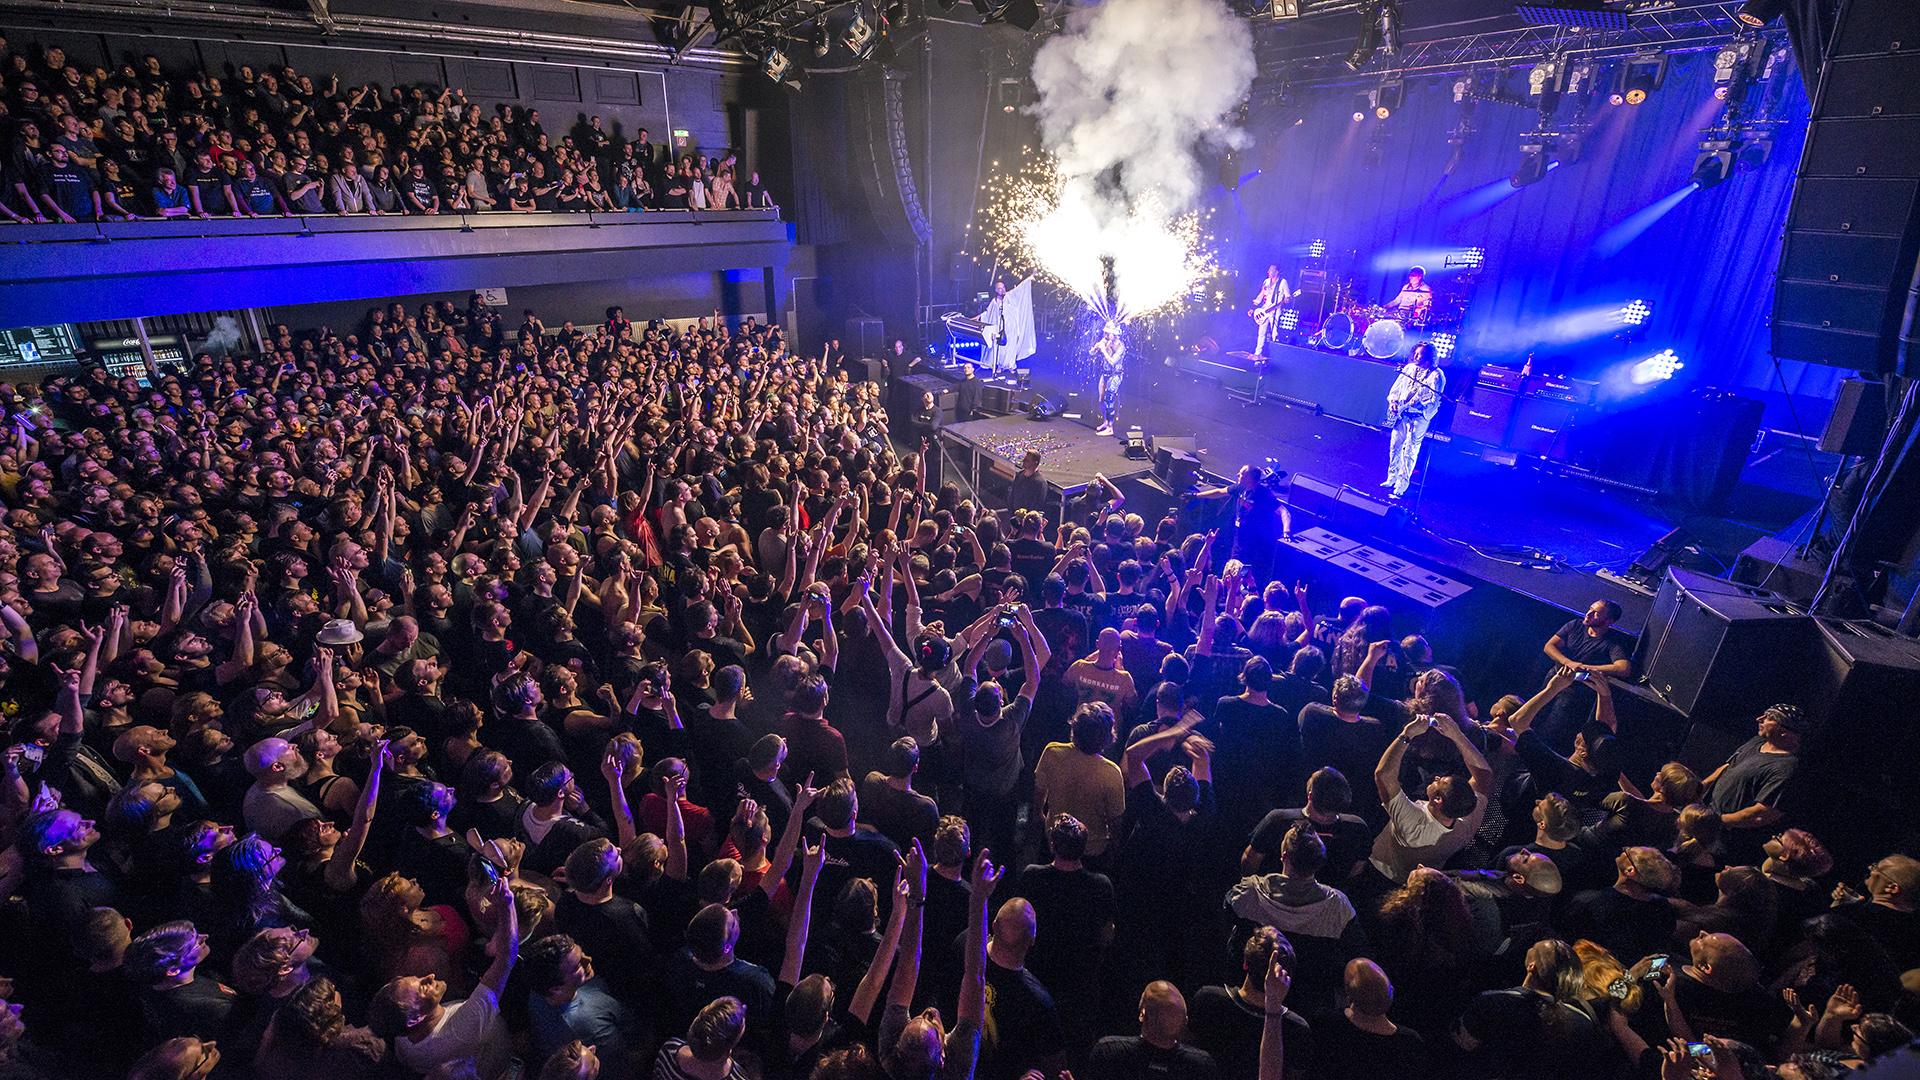 Konzert der Rockband Konorkator in der Columbiahalle. Berlin, 31.03.2017